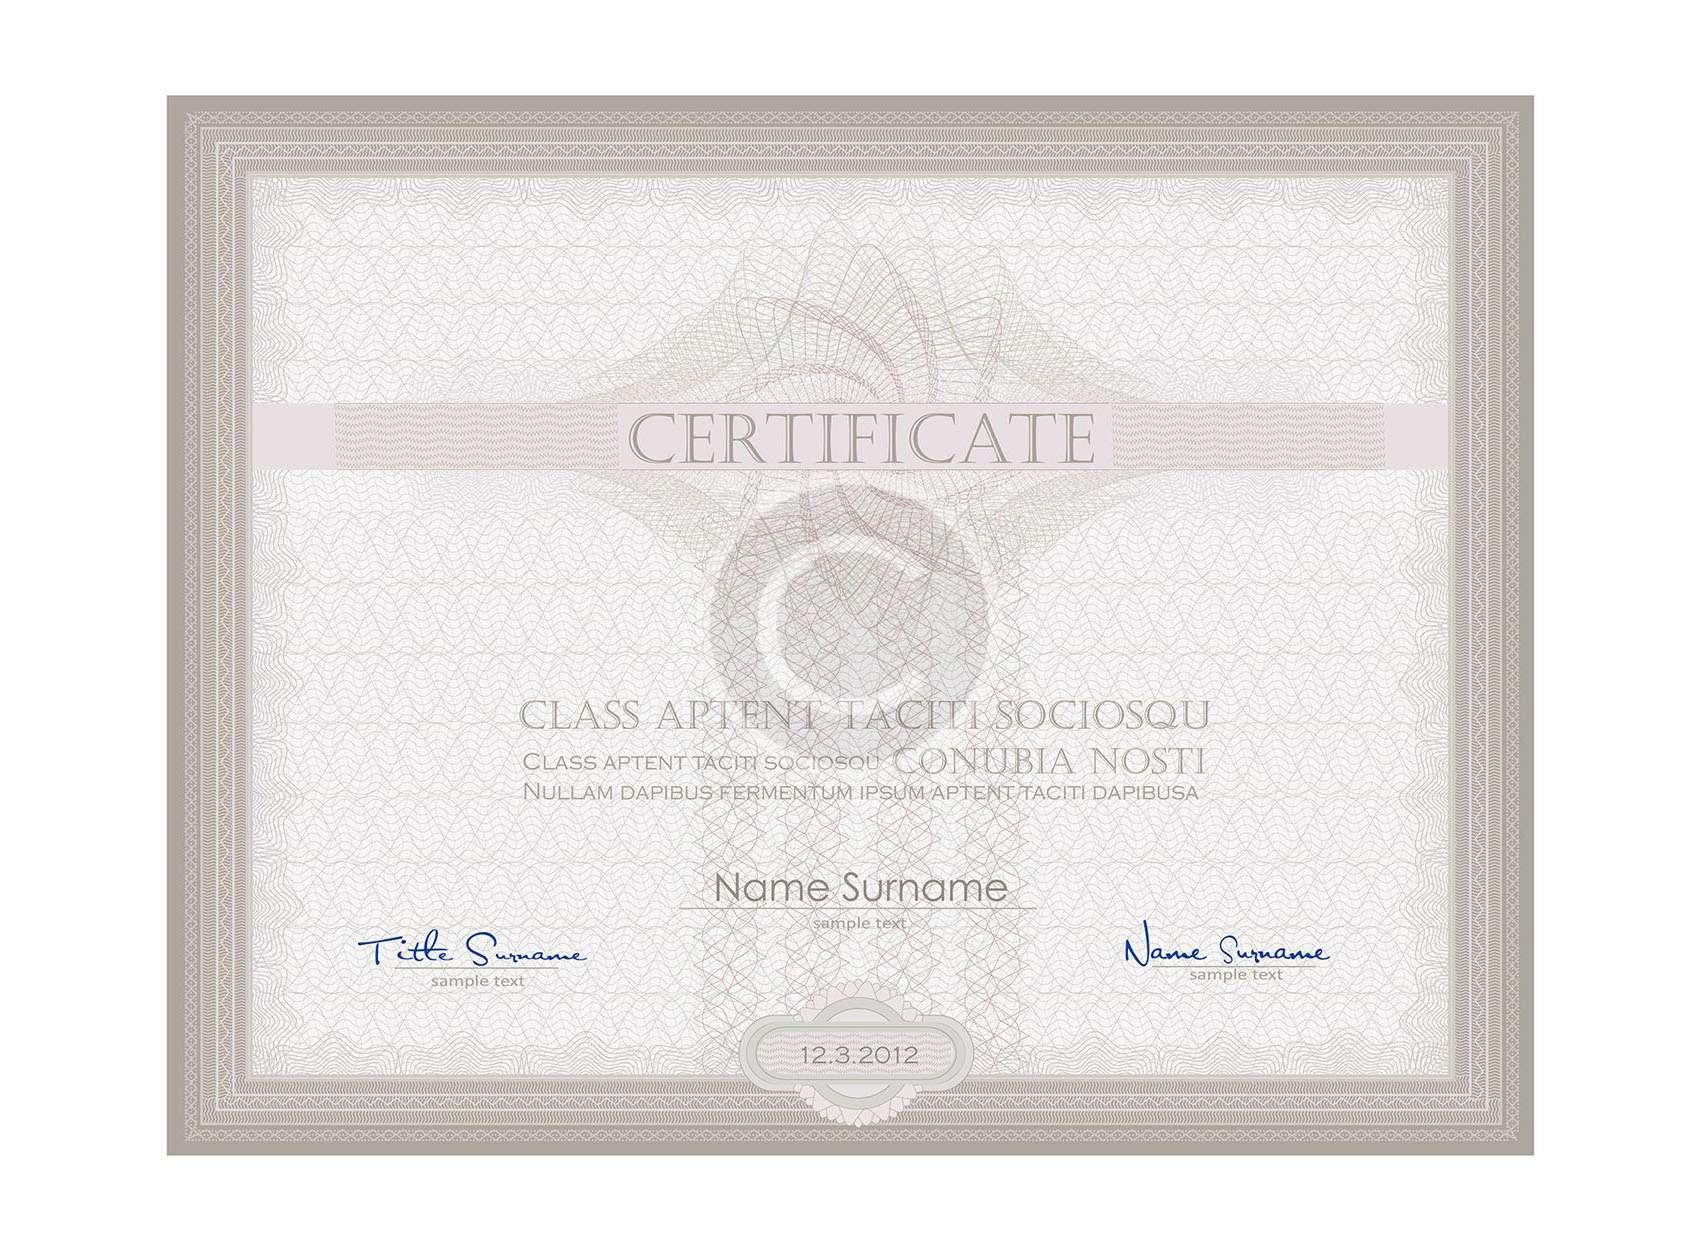 certificate3.jpg?fit=1700%2C1250&s